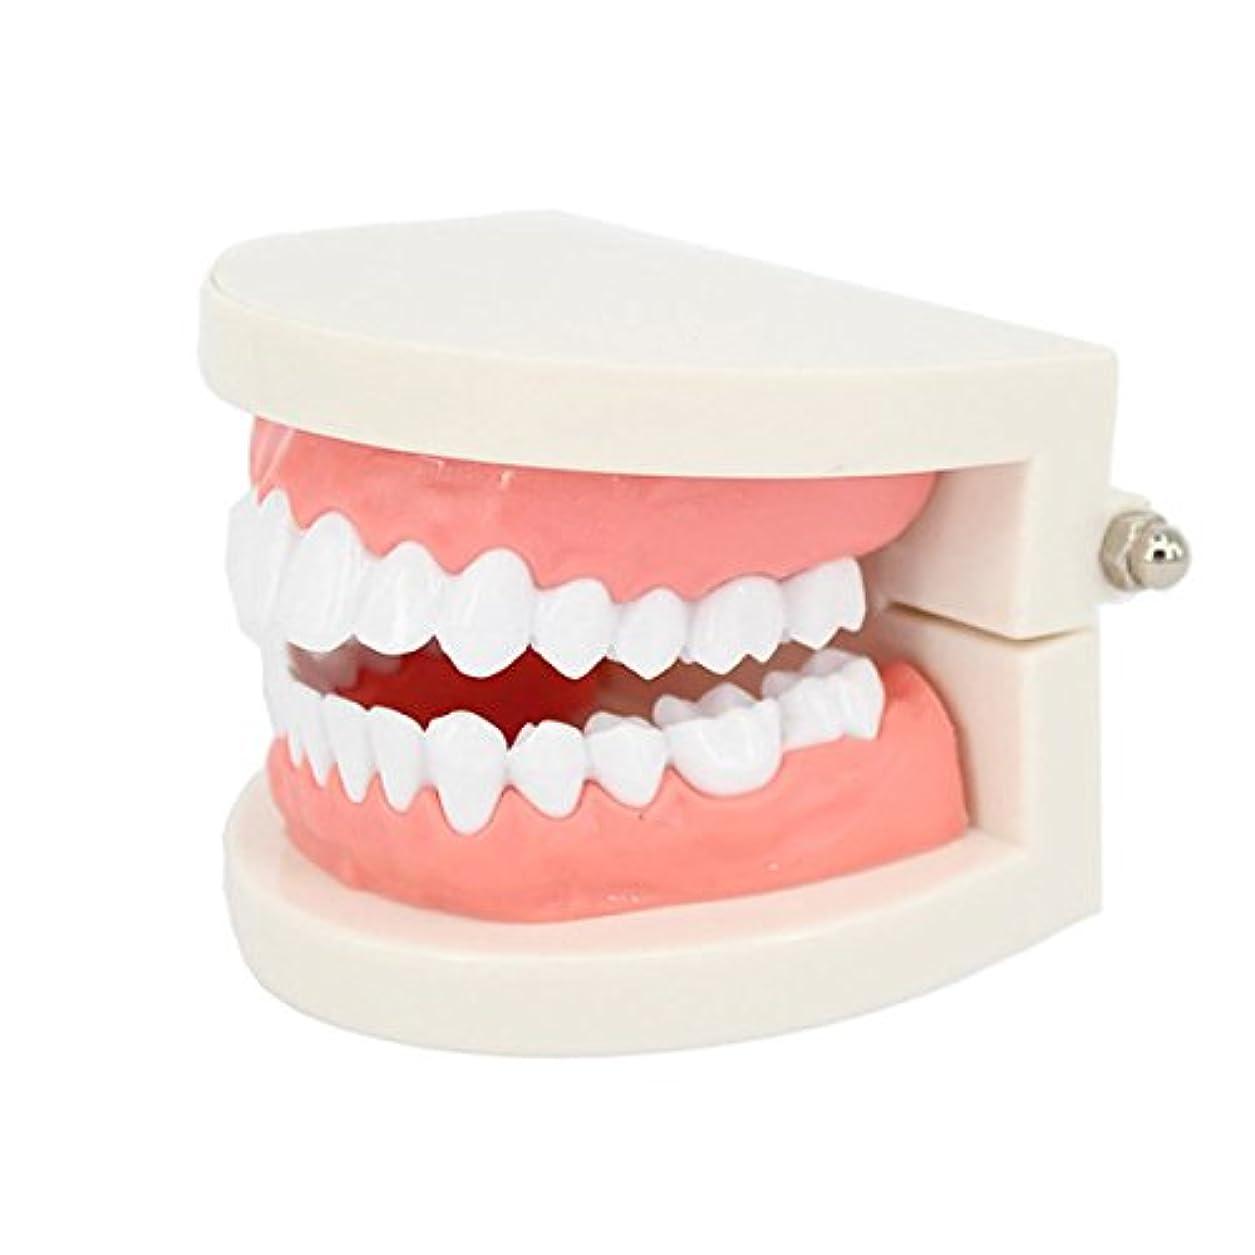 一般的に言えば敬高音ROSENICE 歯科医 歯列模型 歯は着脱可能 指導用模型